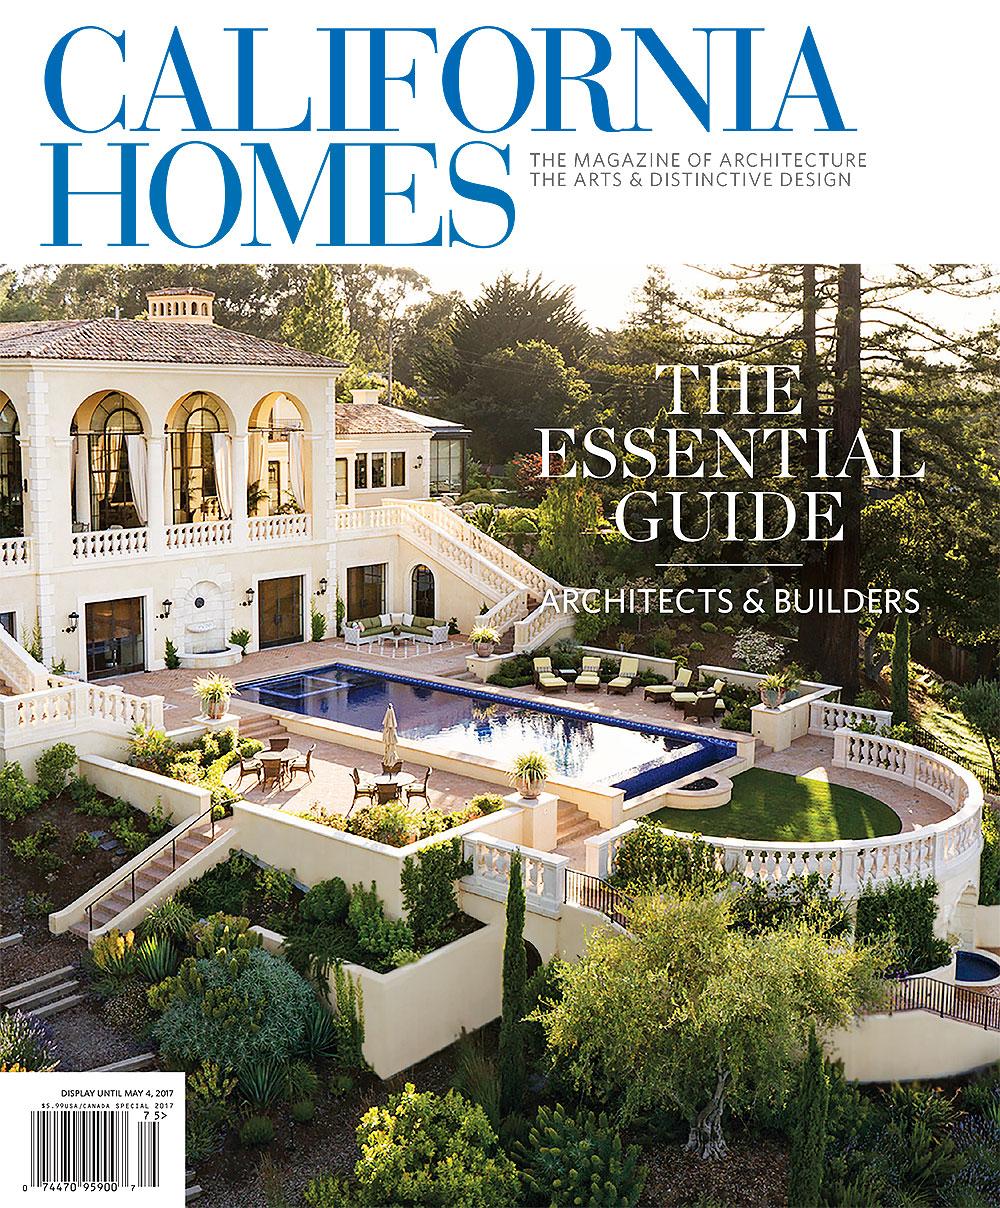 CALIFORNIA HOMES    April 2017   The Essential Guide